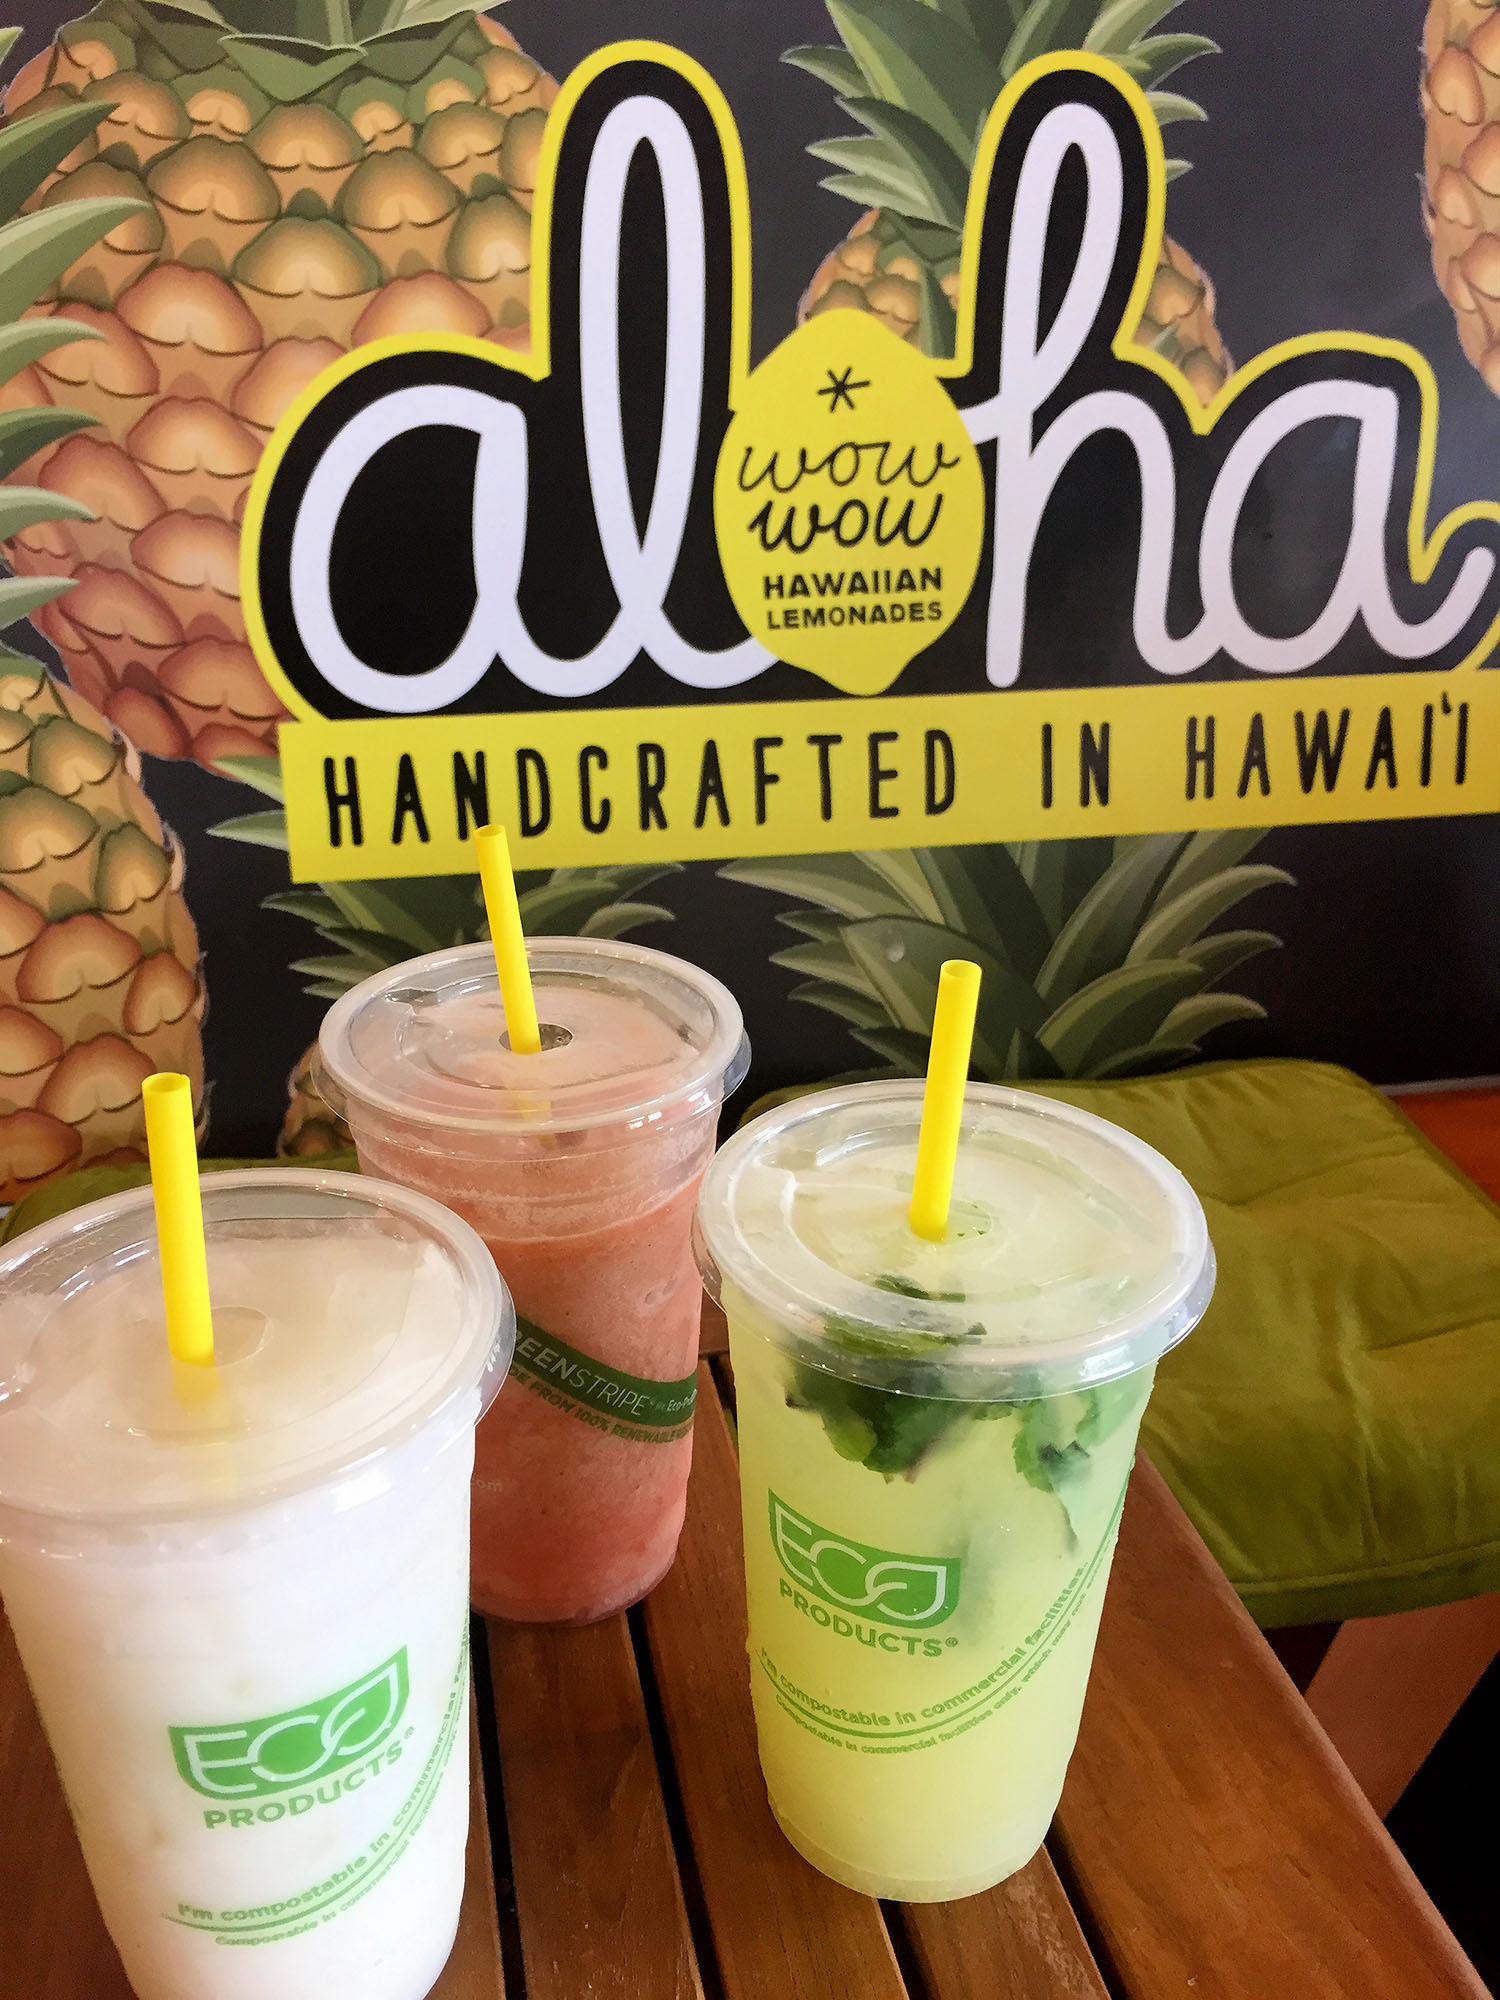 Alohawow1.jpg